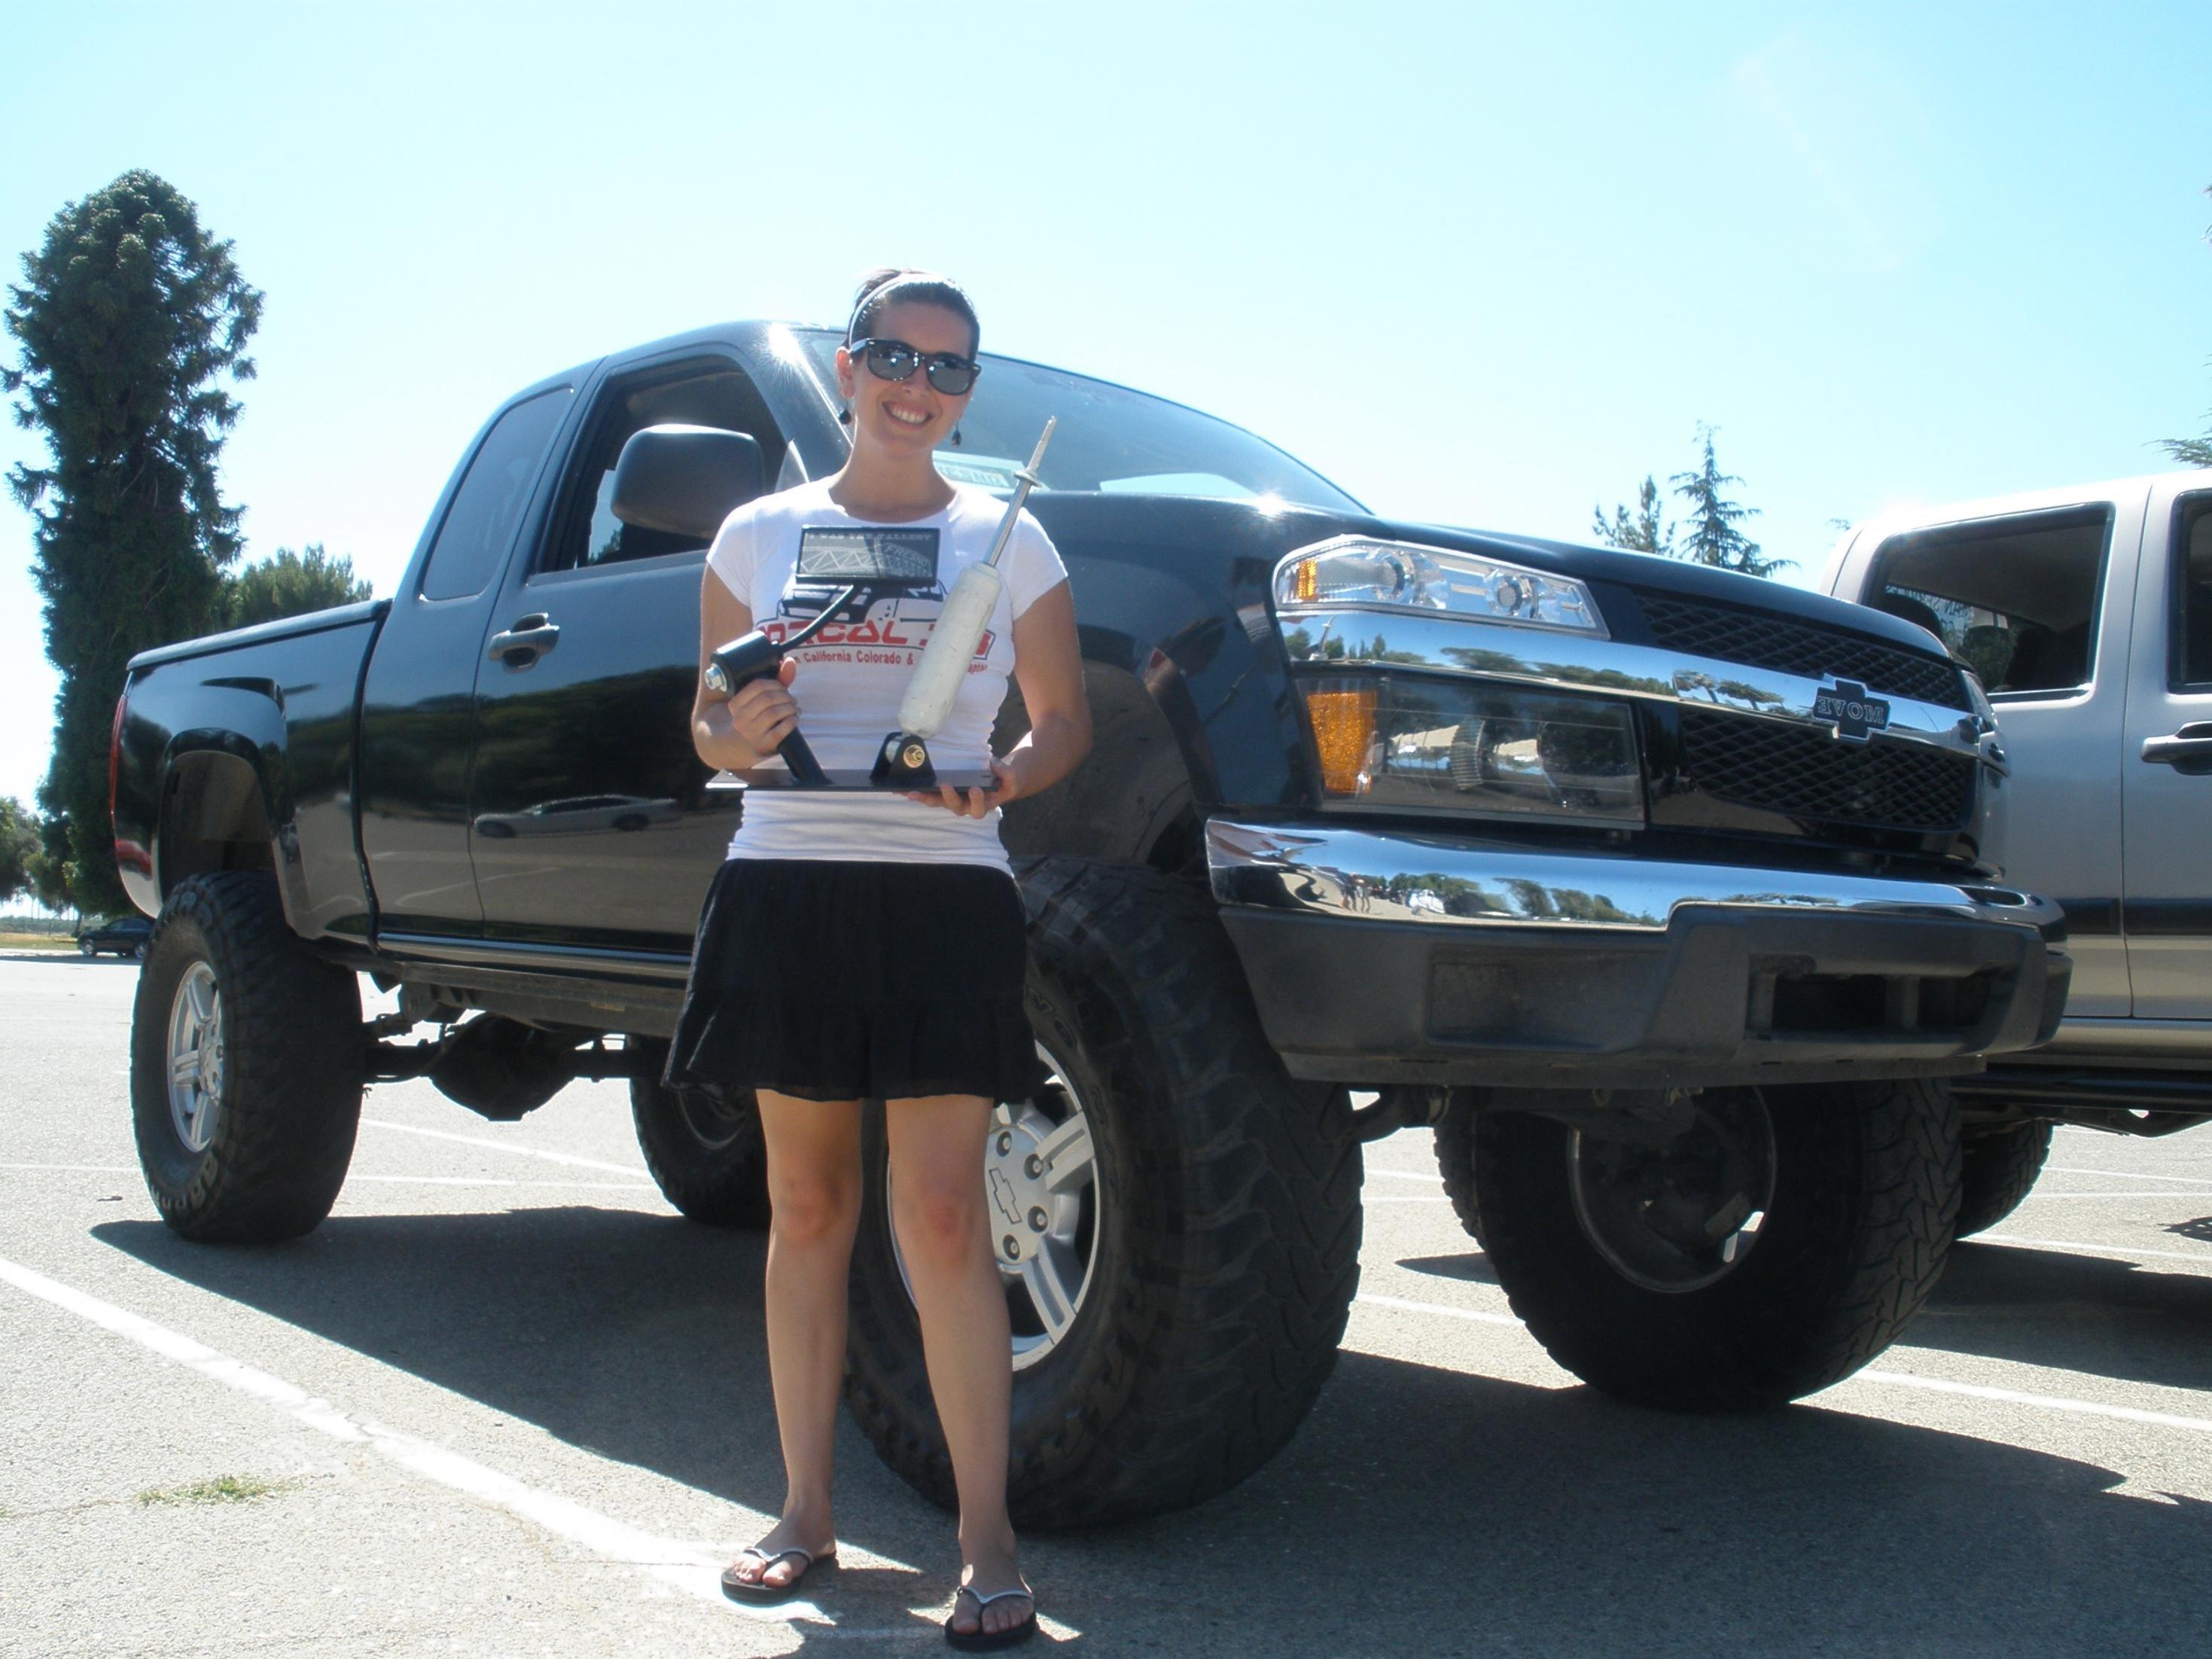 Wheelin with dents n dings Page 36 Chevrolet Colorado & GMC